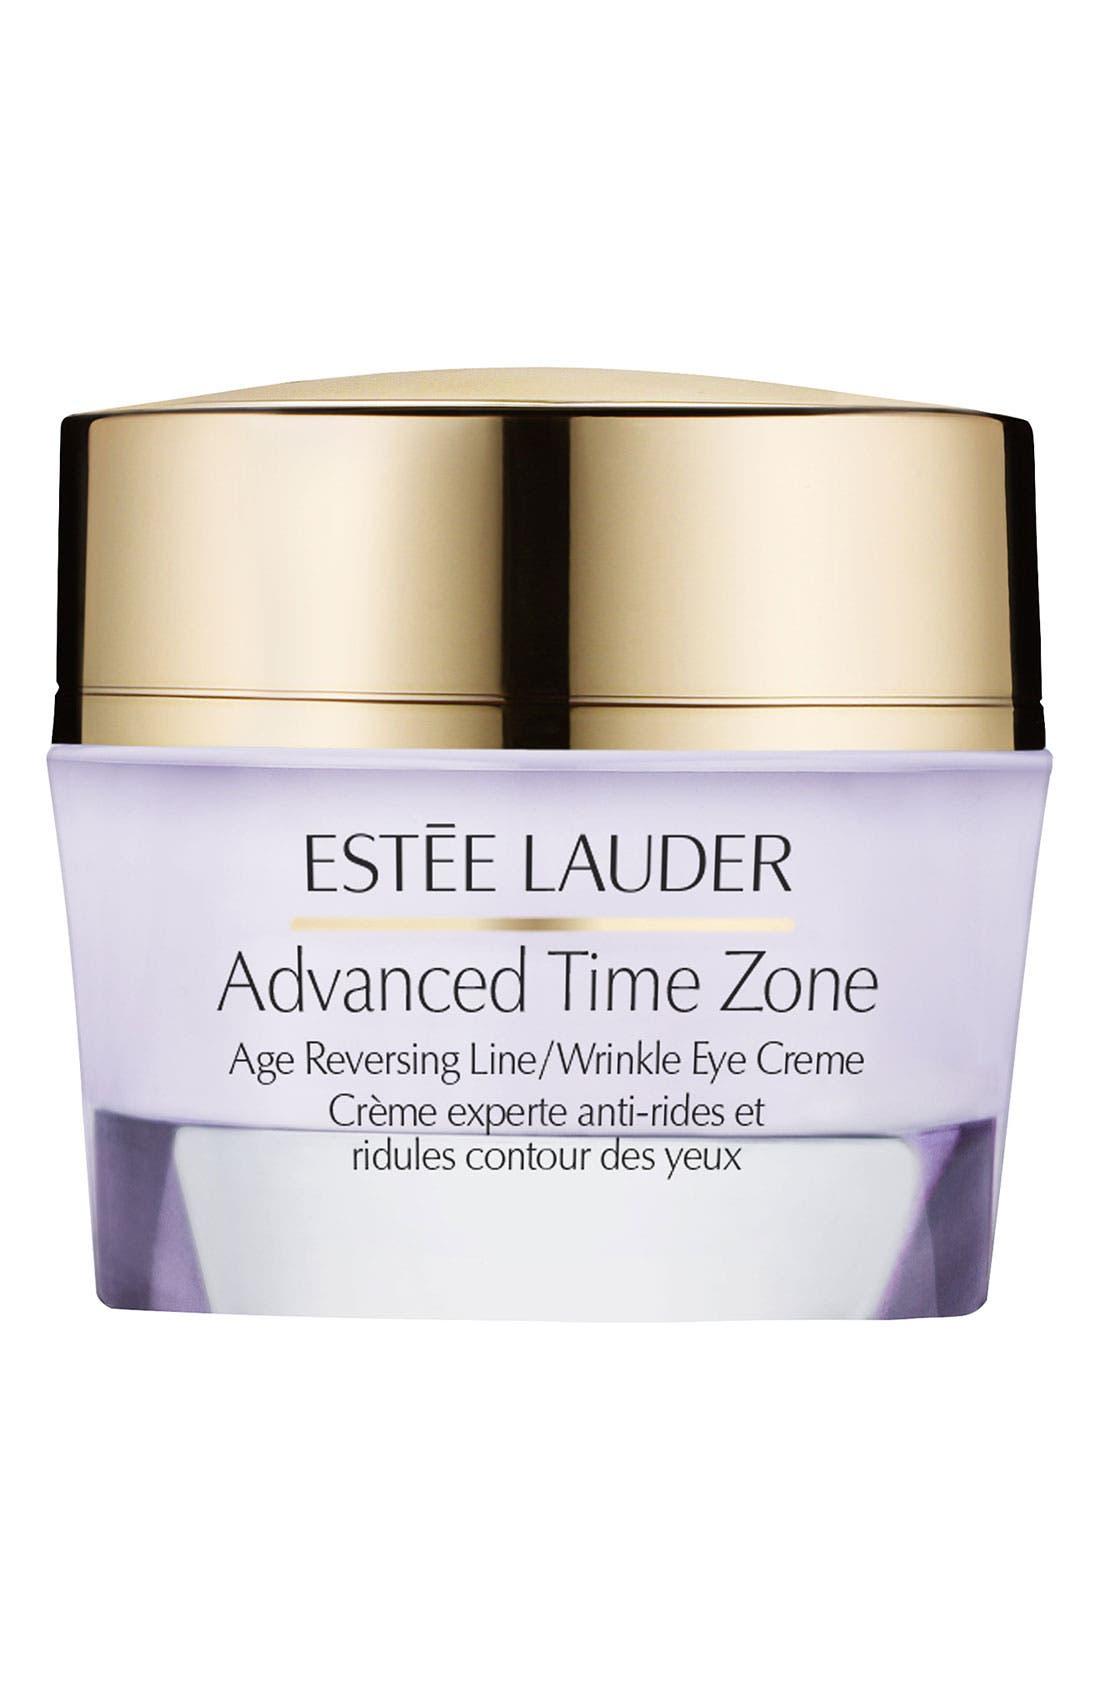 Estée Lauder Advanced Time Zone Age Reversing Line/Wrinkle Eye Creme